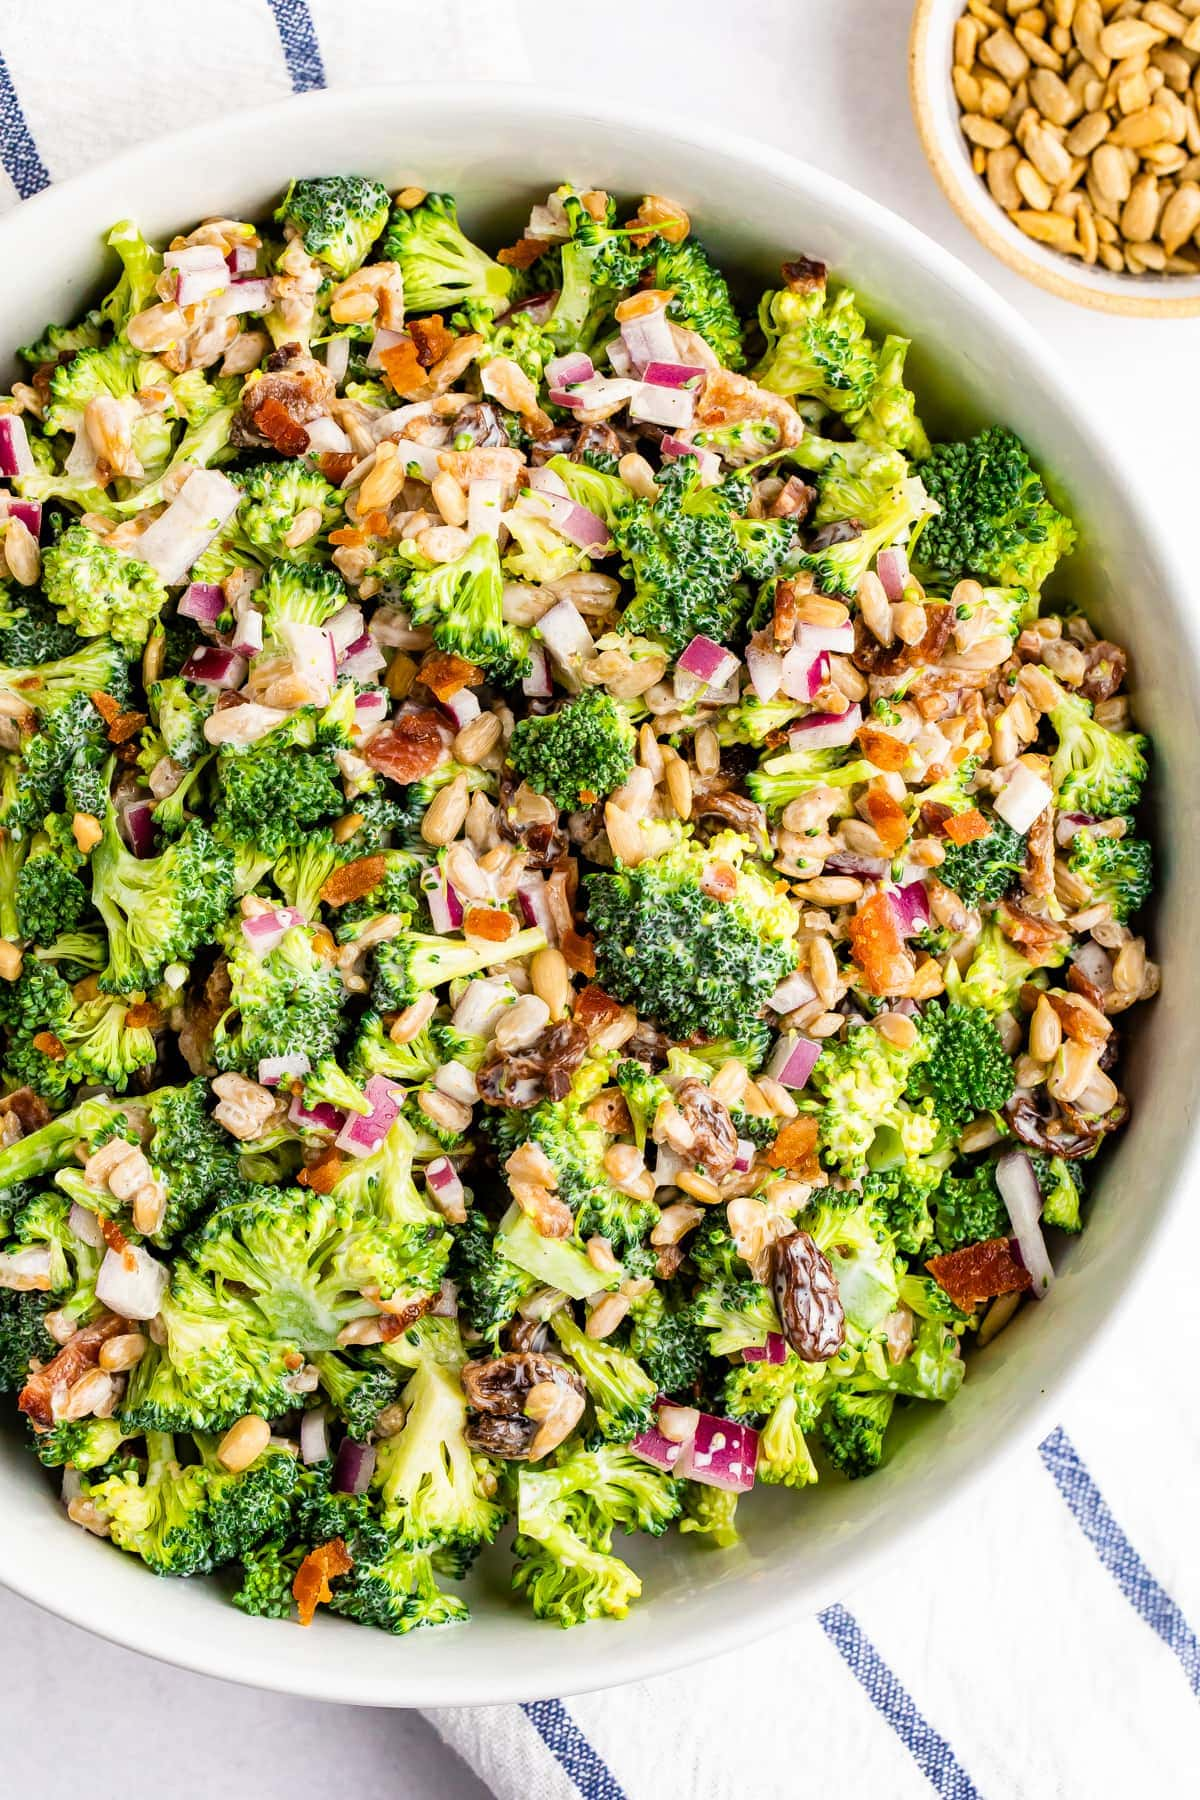 Broccoli Salad Recipe Printable